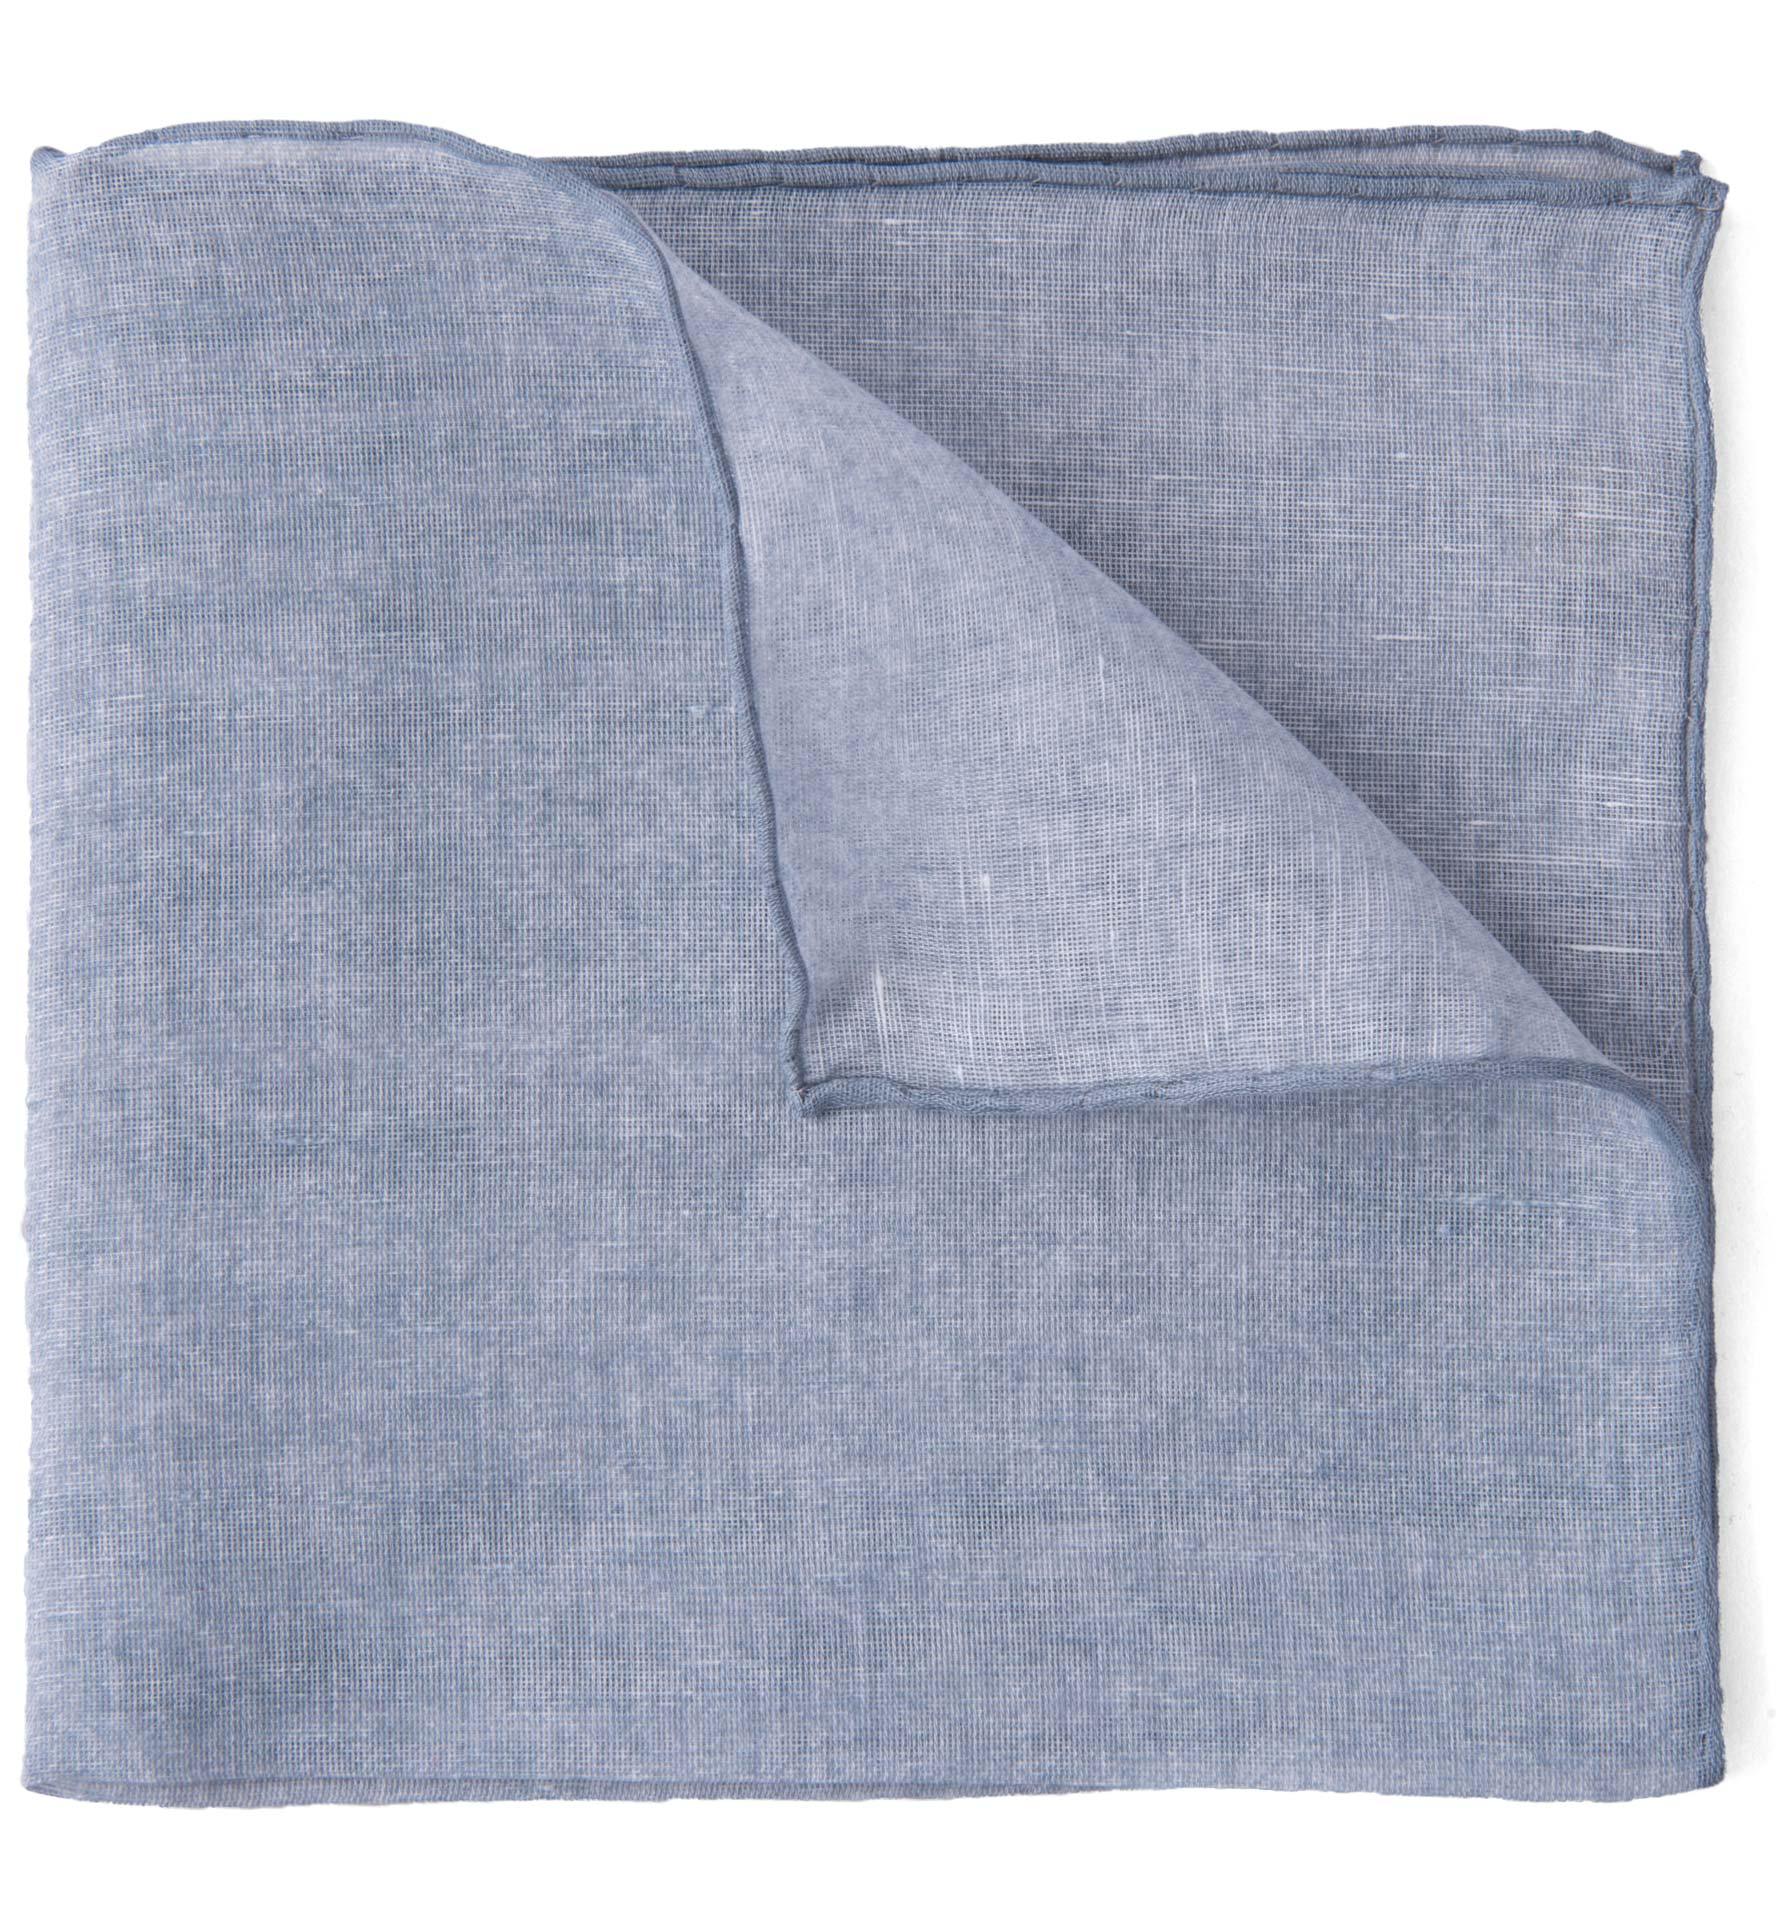 Zoom Image of Grey Cotton Linen Pocket Square